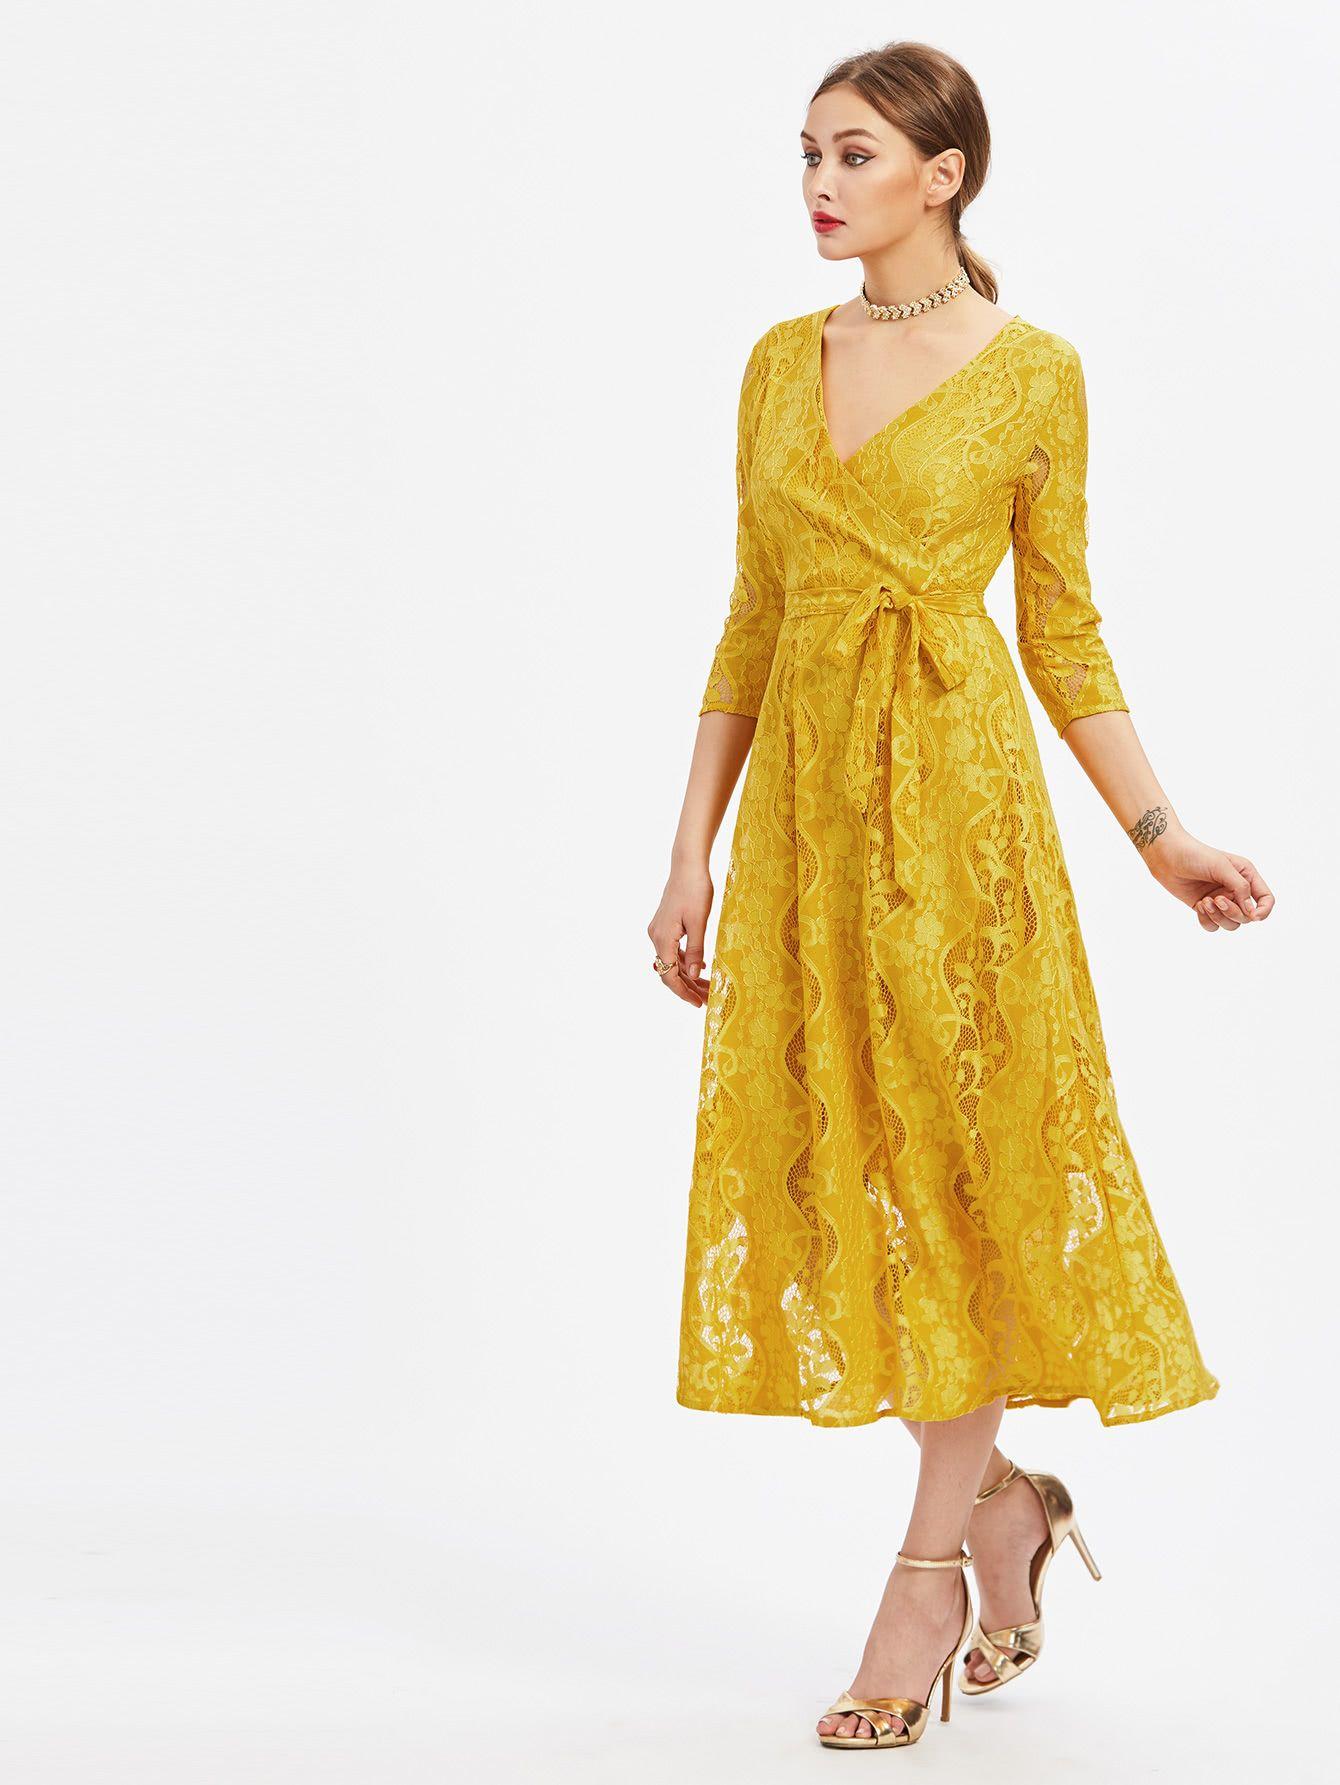 lace surplice front self tie dress | kleid spitze, kleider